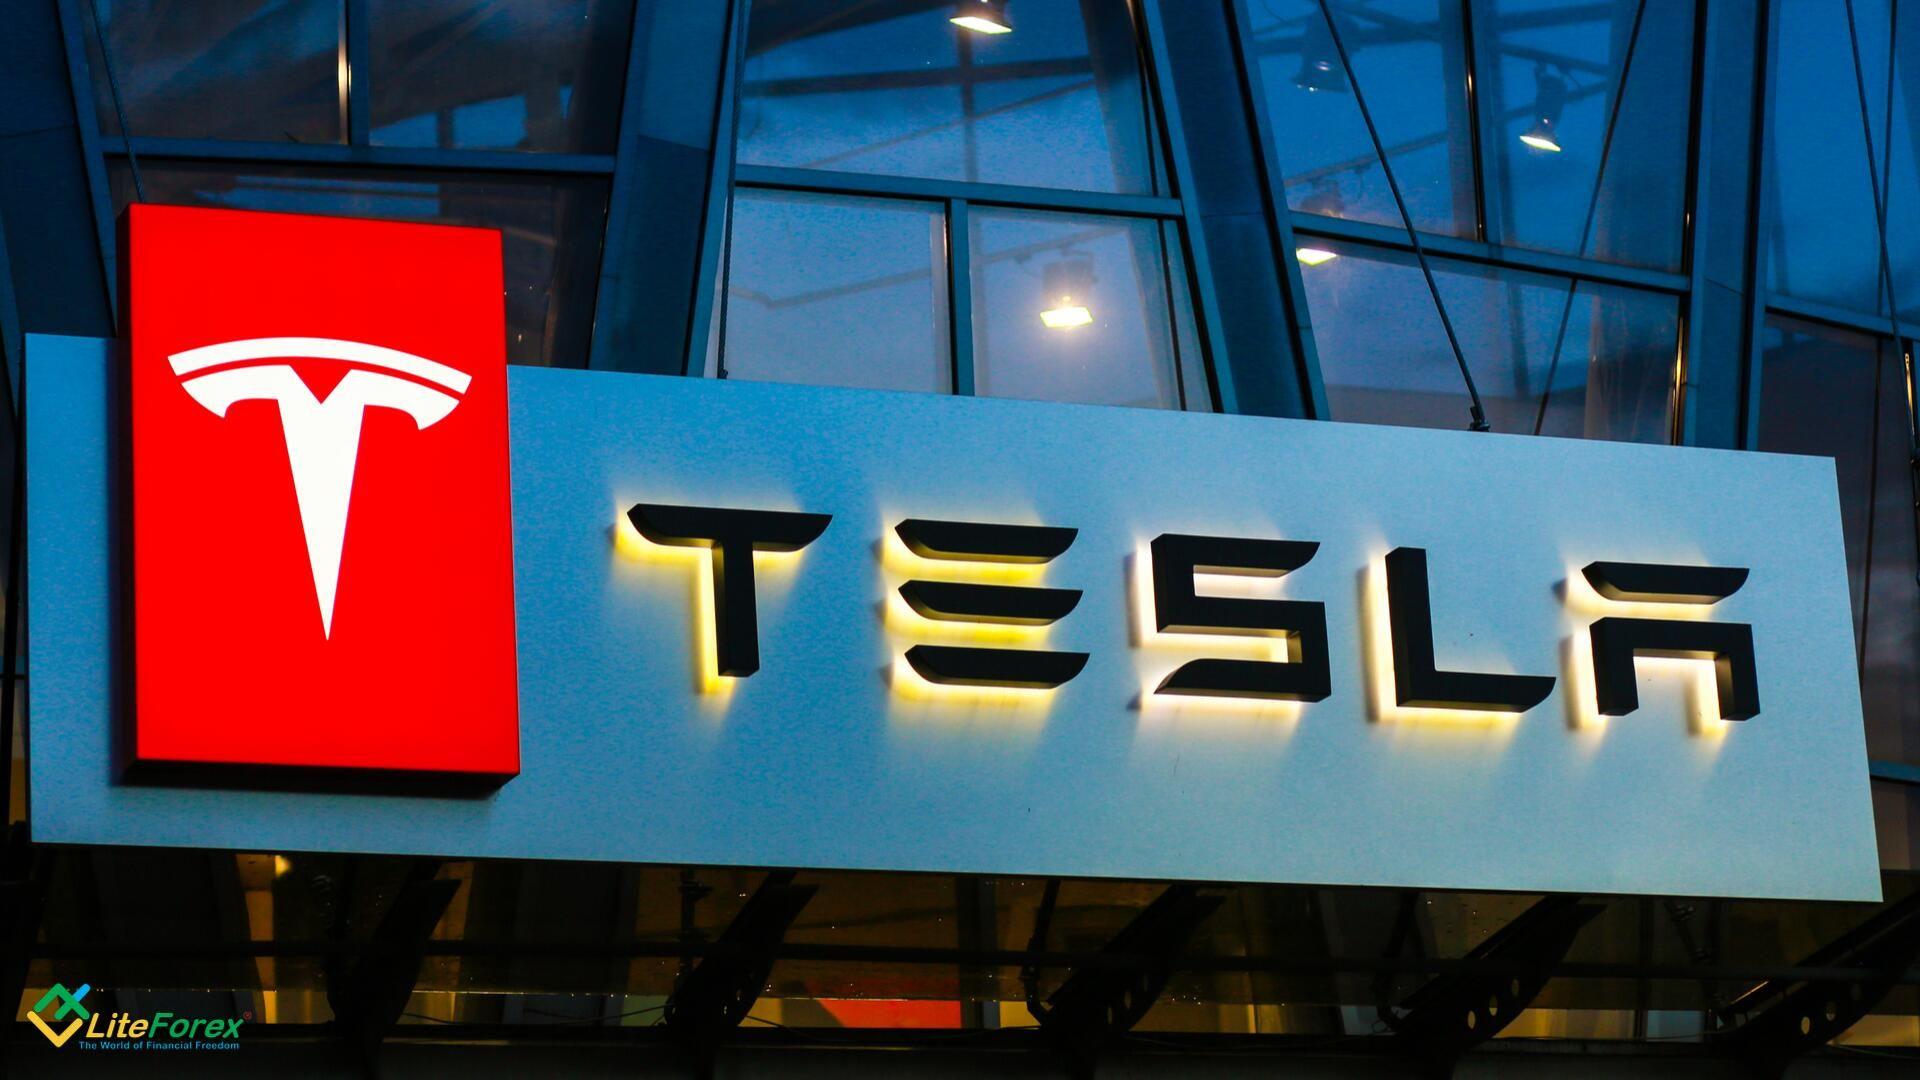 Акции Tesla войдут в S&P 500 одним траншем- Kapital.kz